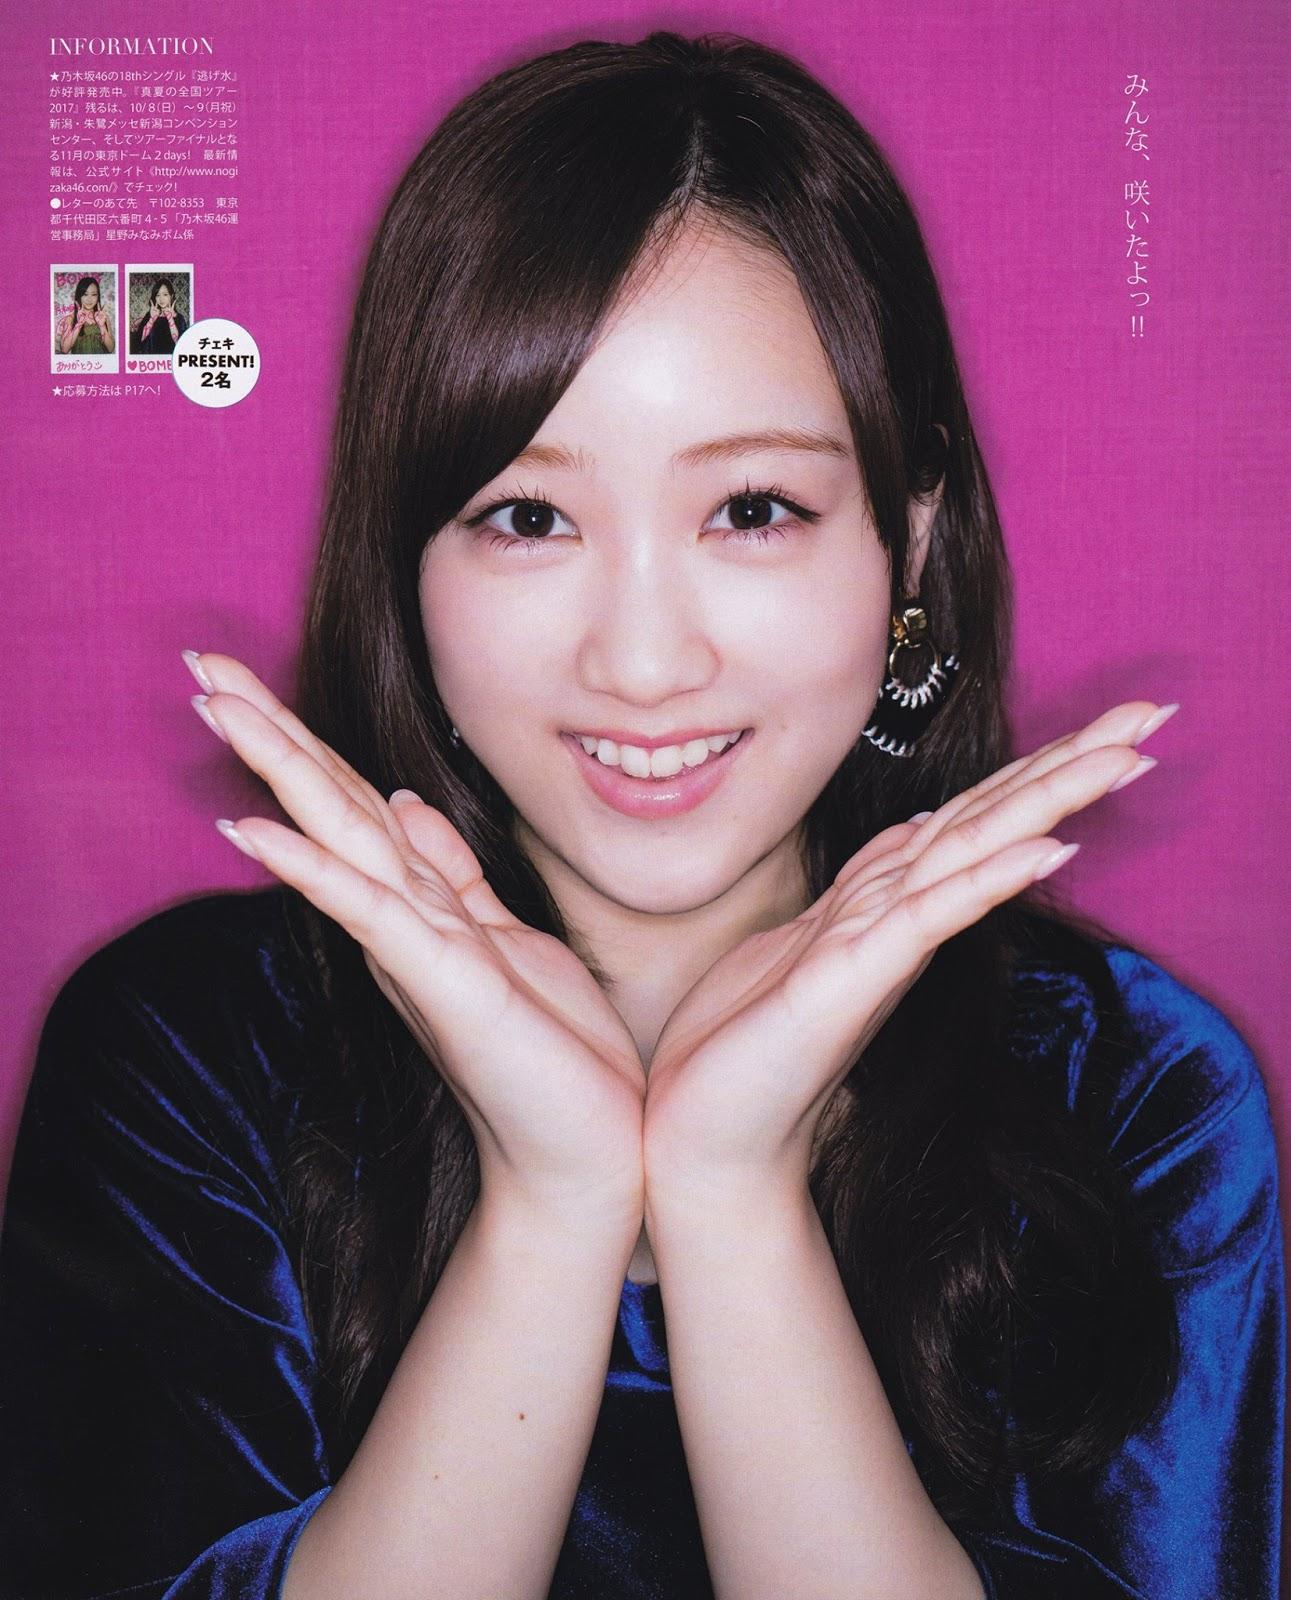 Hoshino Minami 星野みなみ, BOMB! 2017.10 (ボム 2017年10月号)